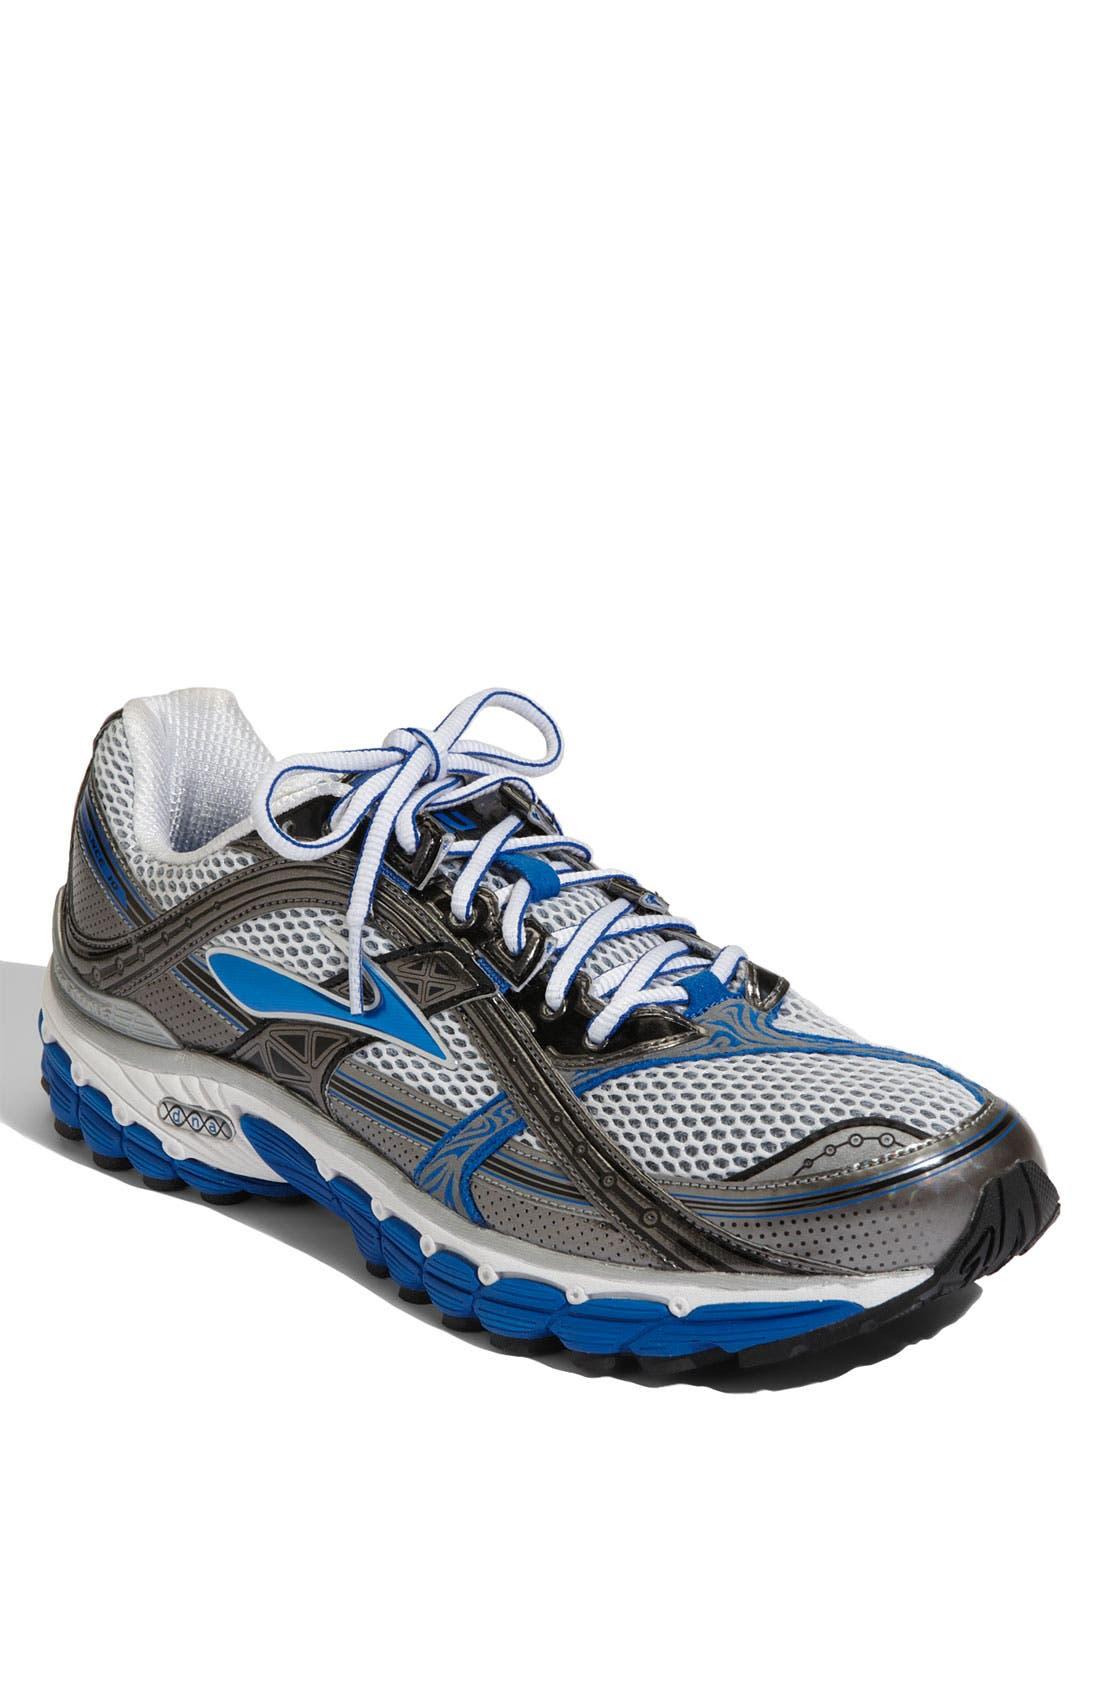 Main Image - Brooks 'Trance 10' Running Shoe (Men)